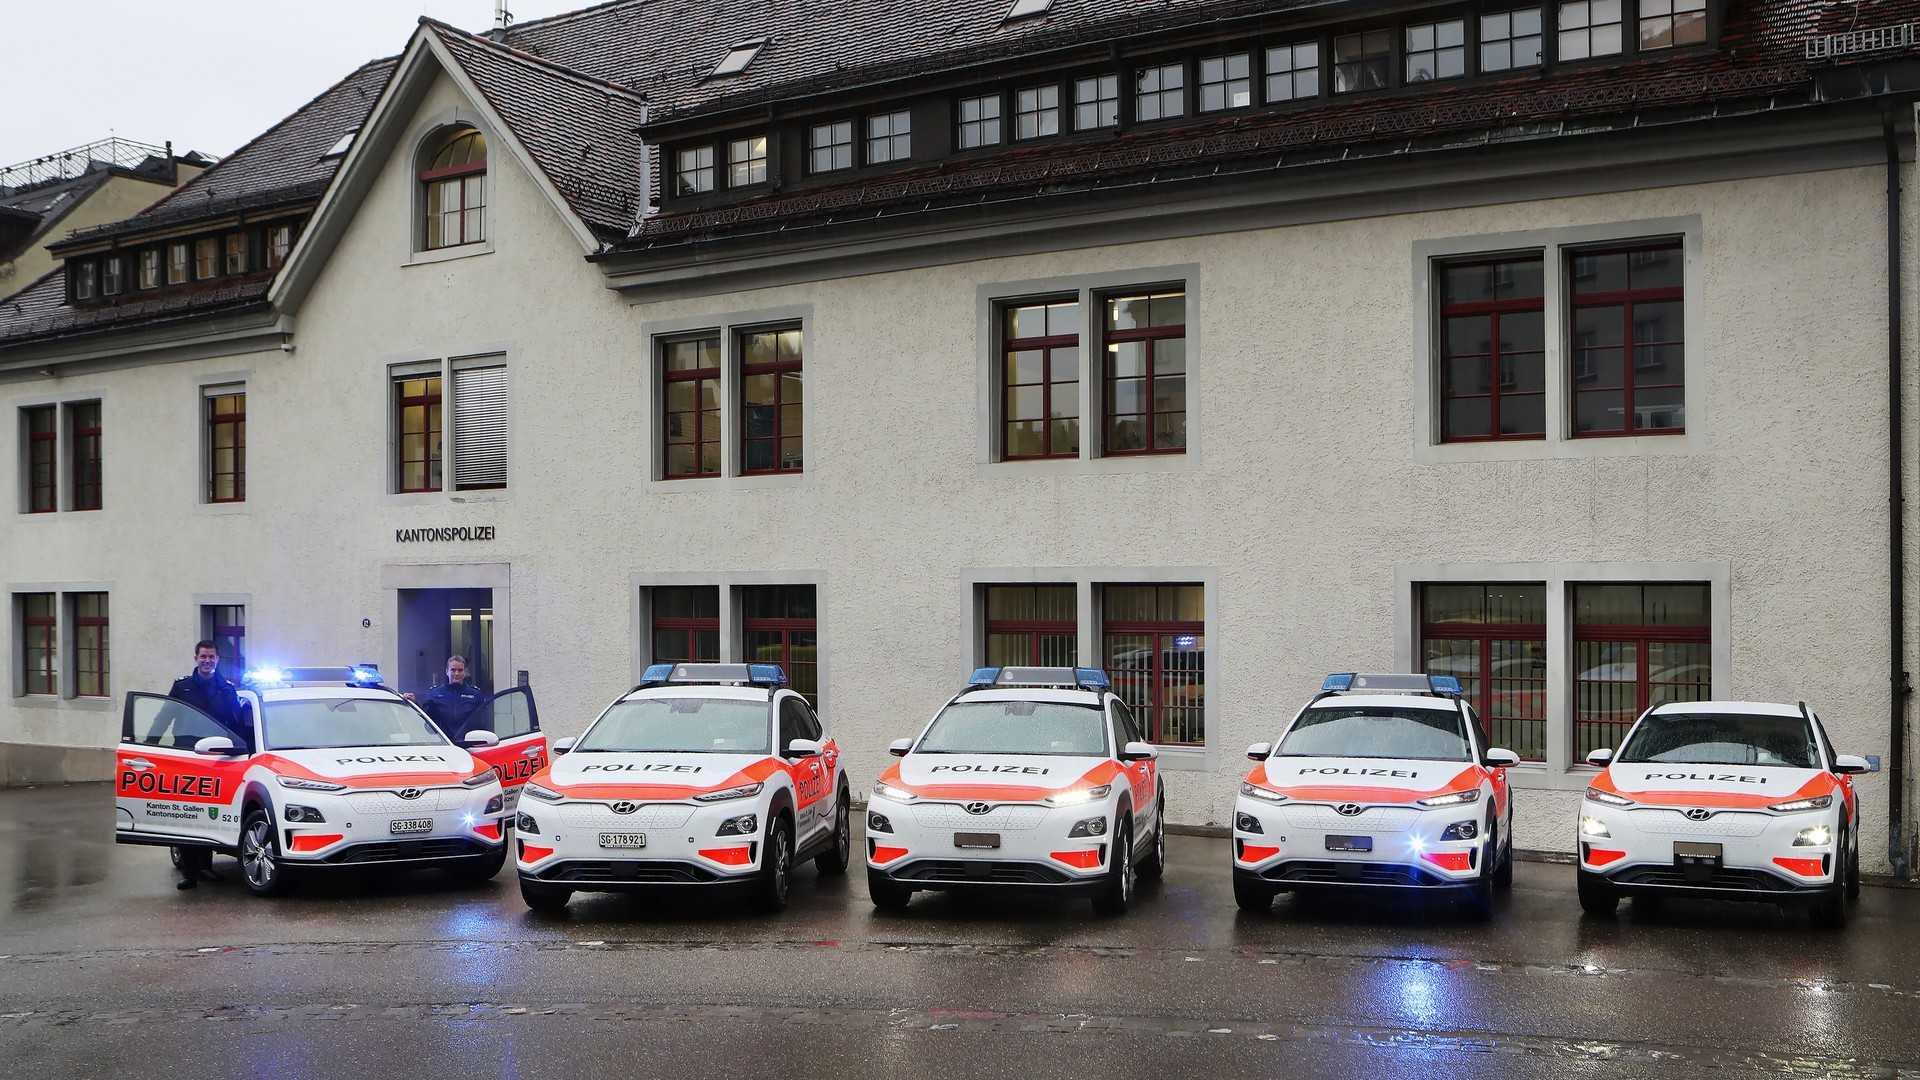 Hyundai Kona Electric And NEXO Aim To Make European Police Forces Greener